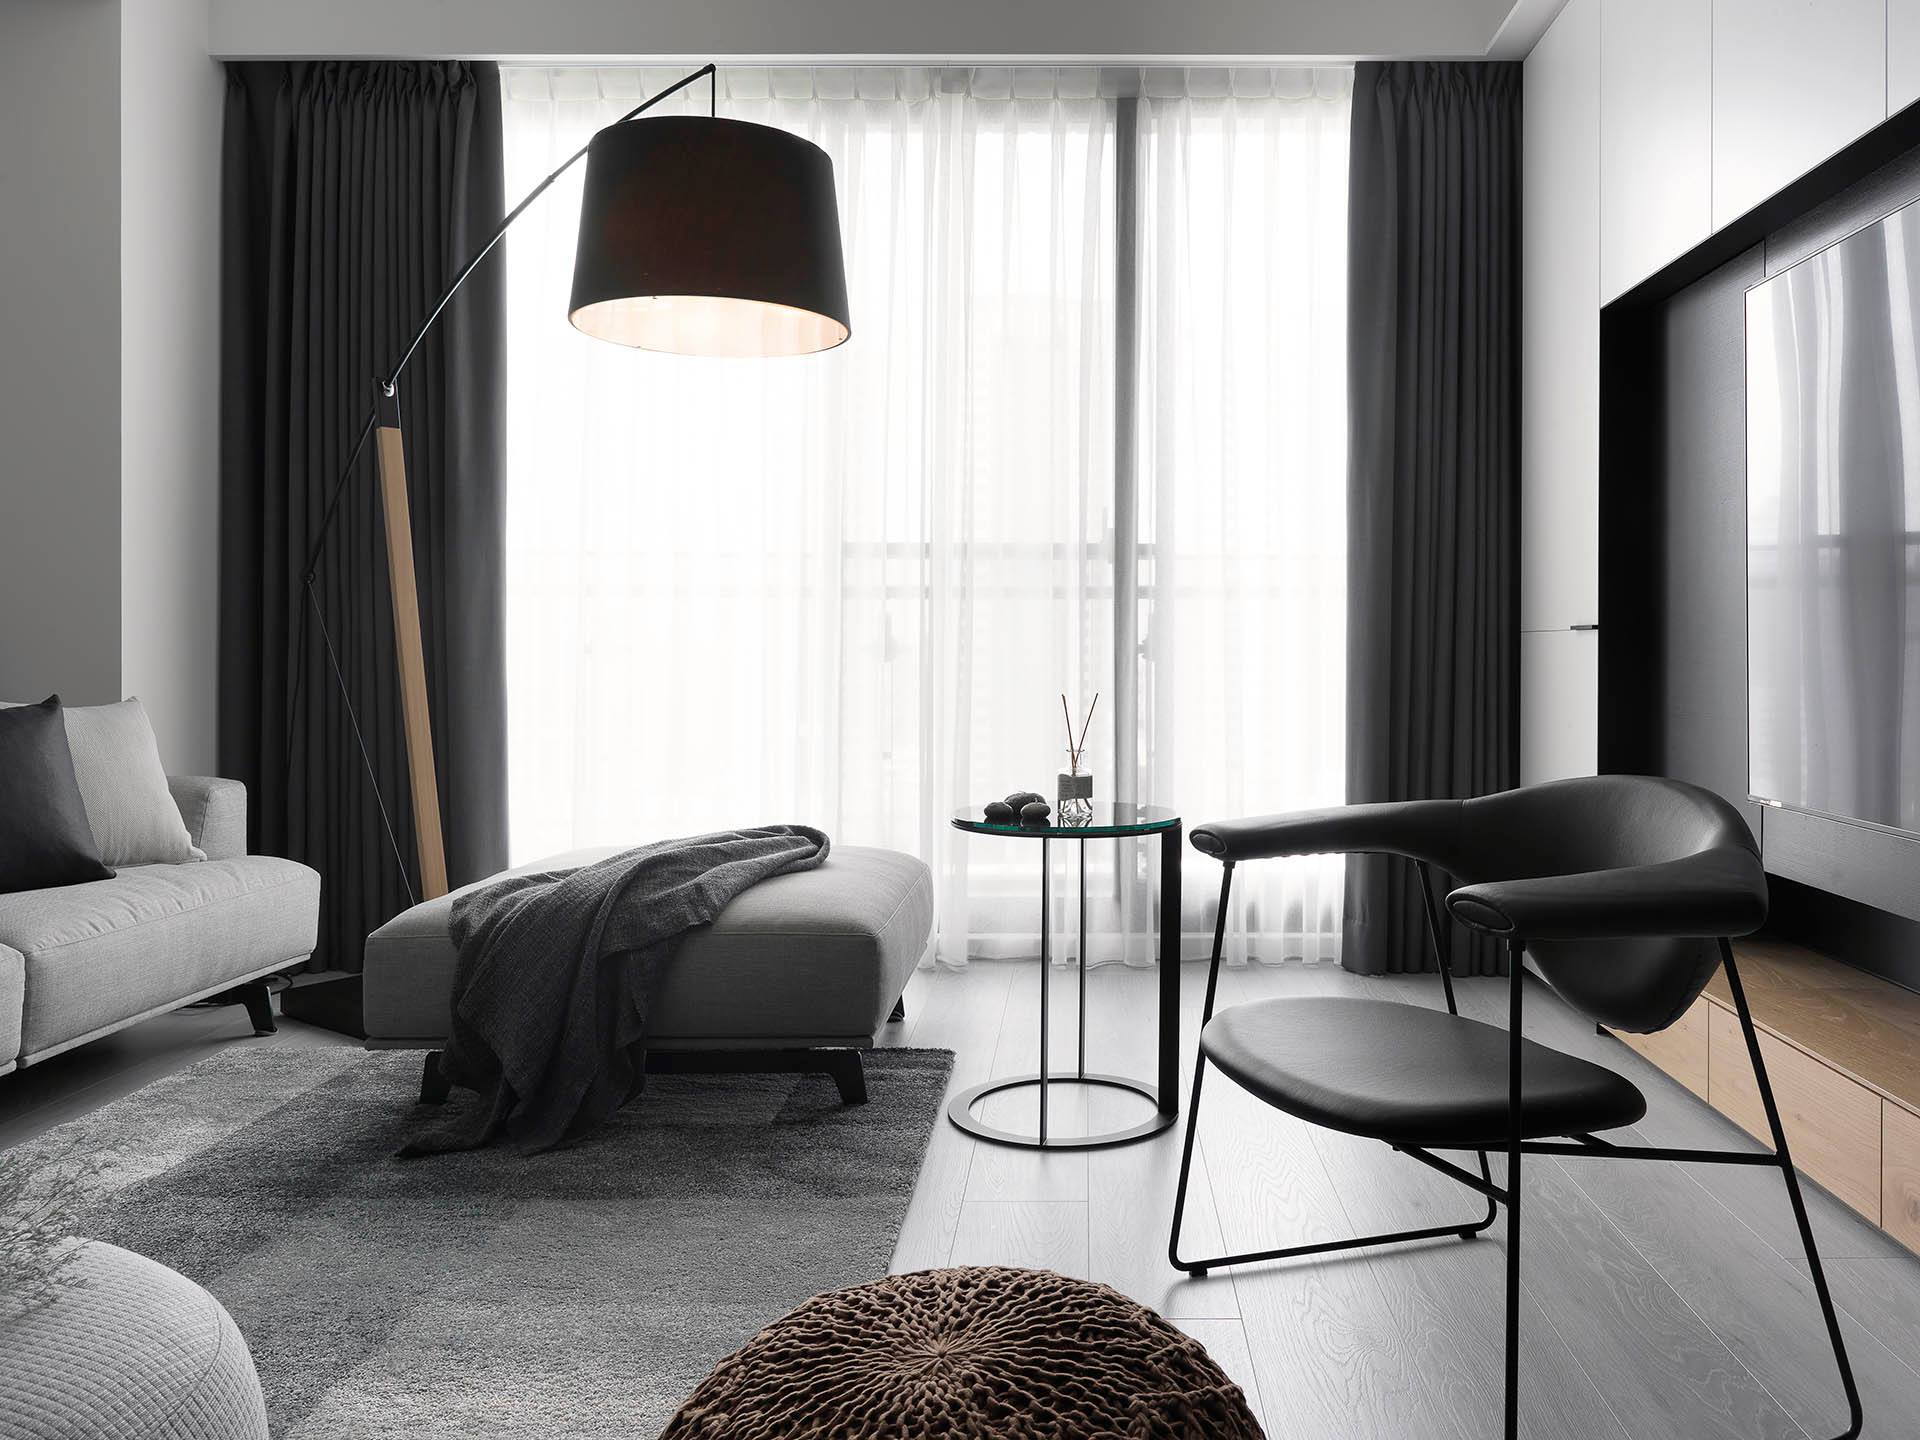 SEED Design Archer Floor Lamp